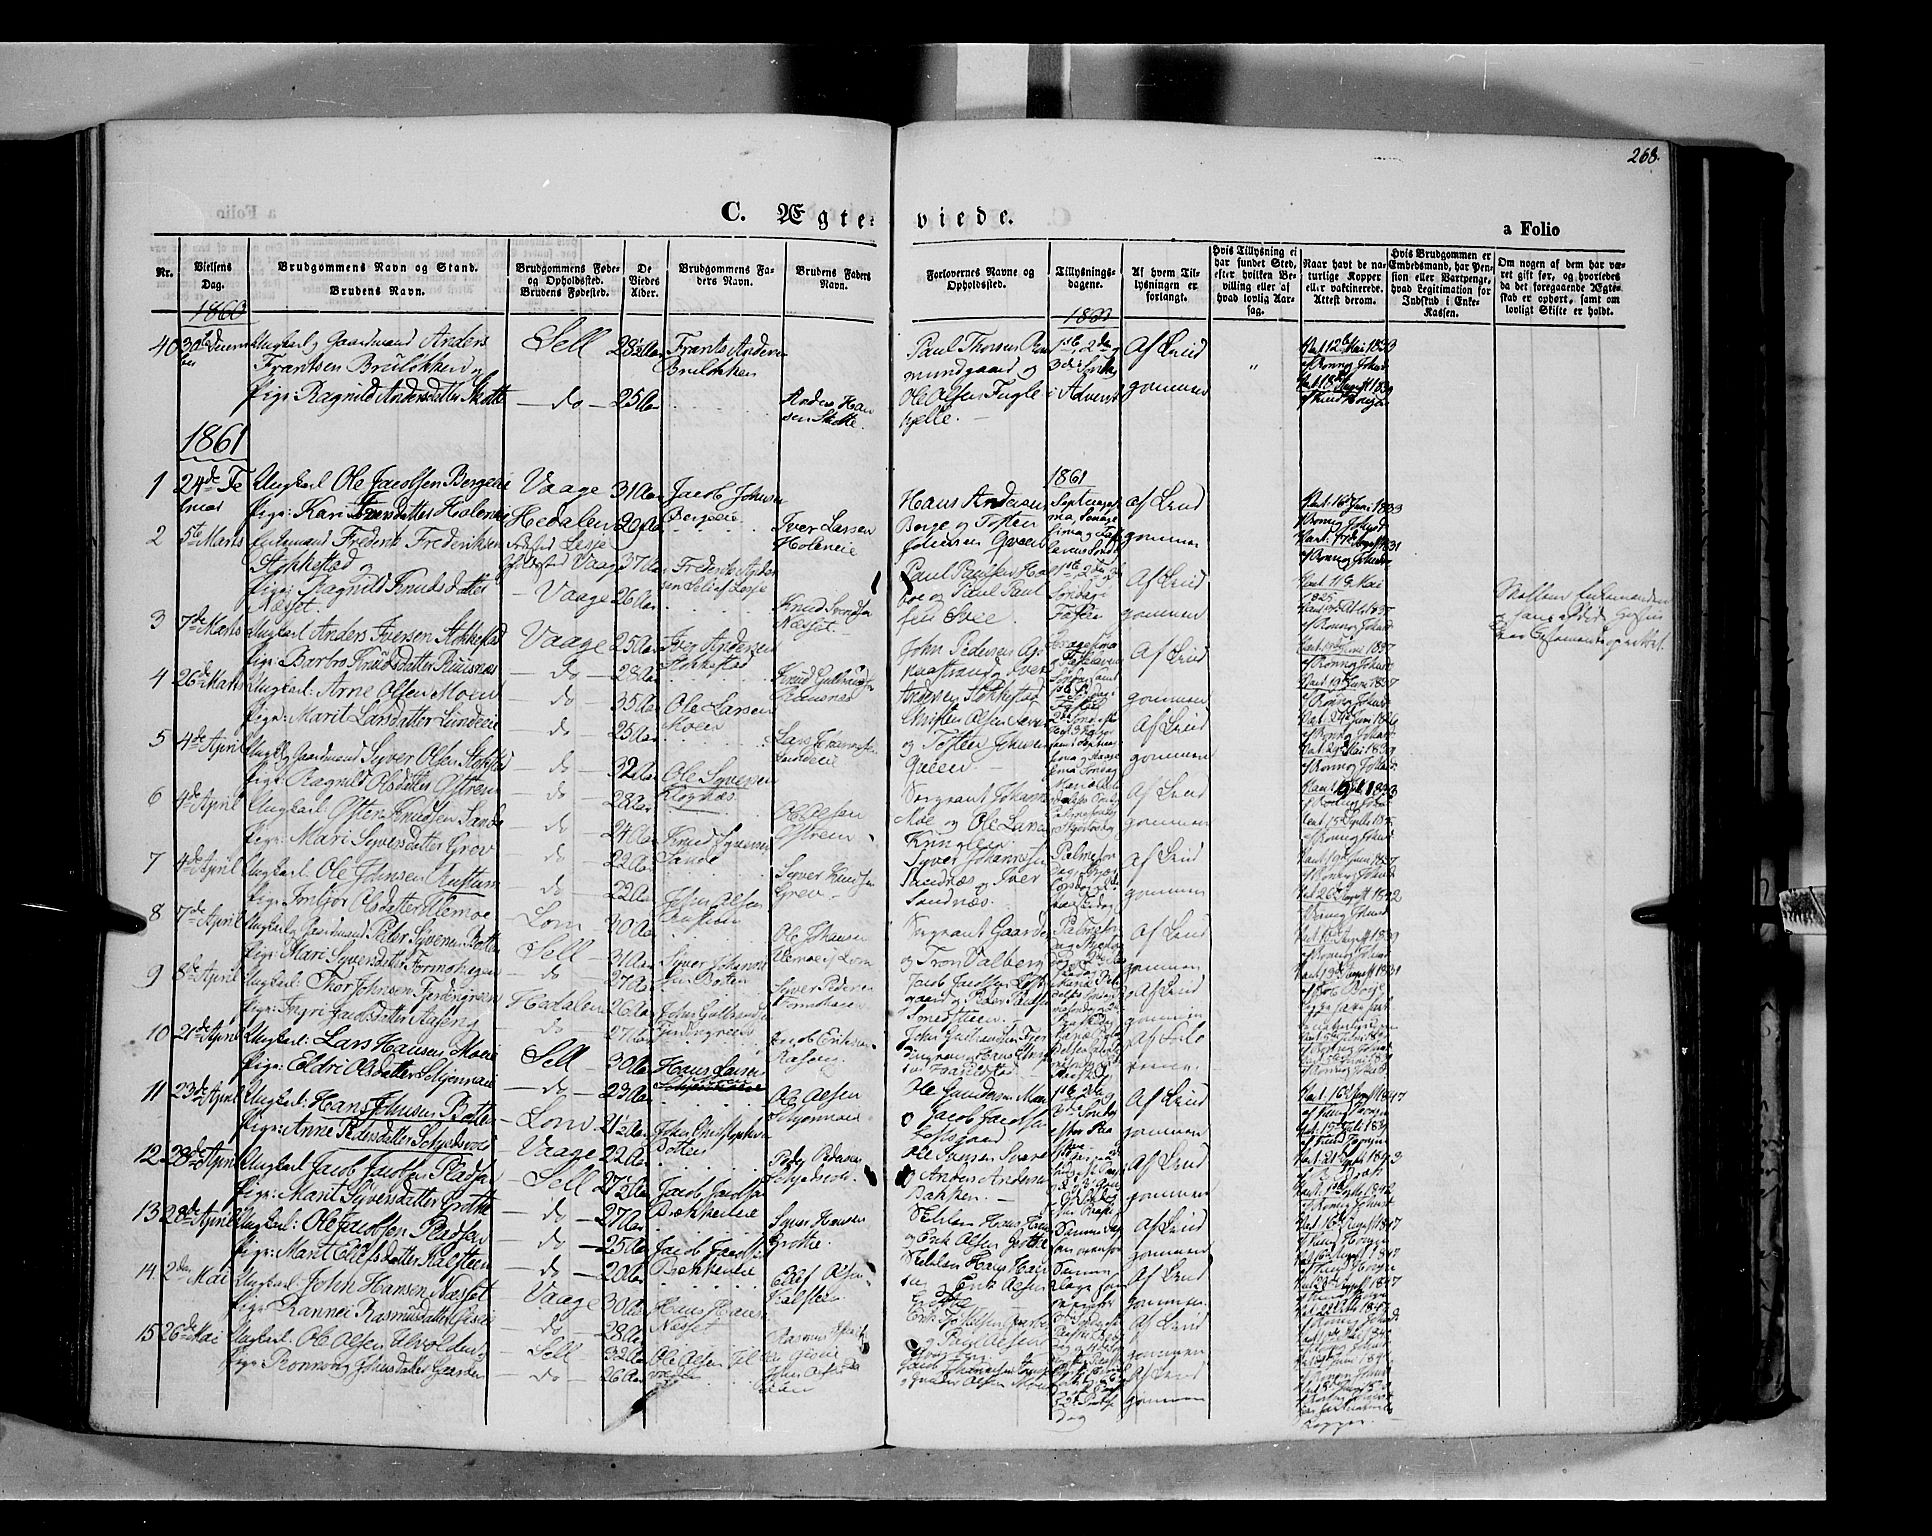 SAH, Vågå prestekontor, Ministerialbok nr. 6 /1, 1856-1872, s. 268